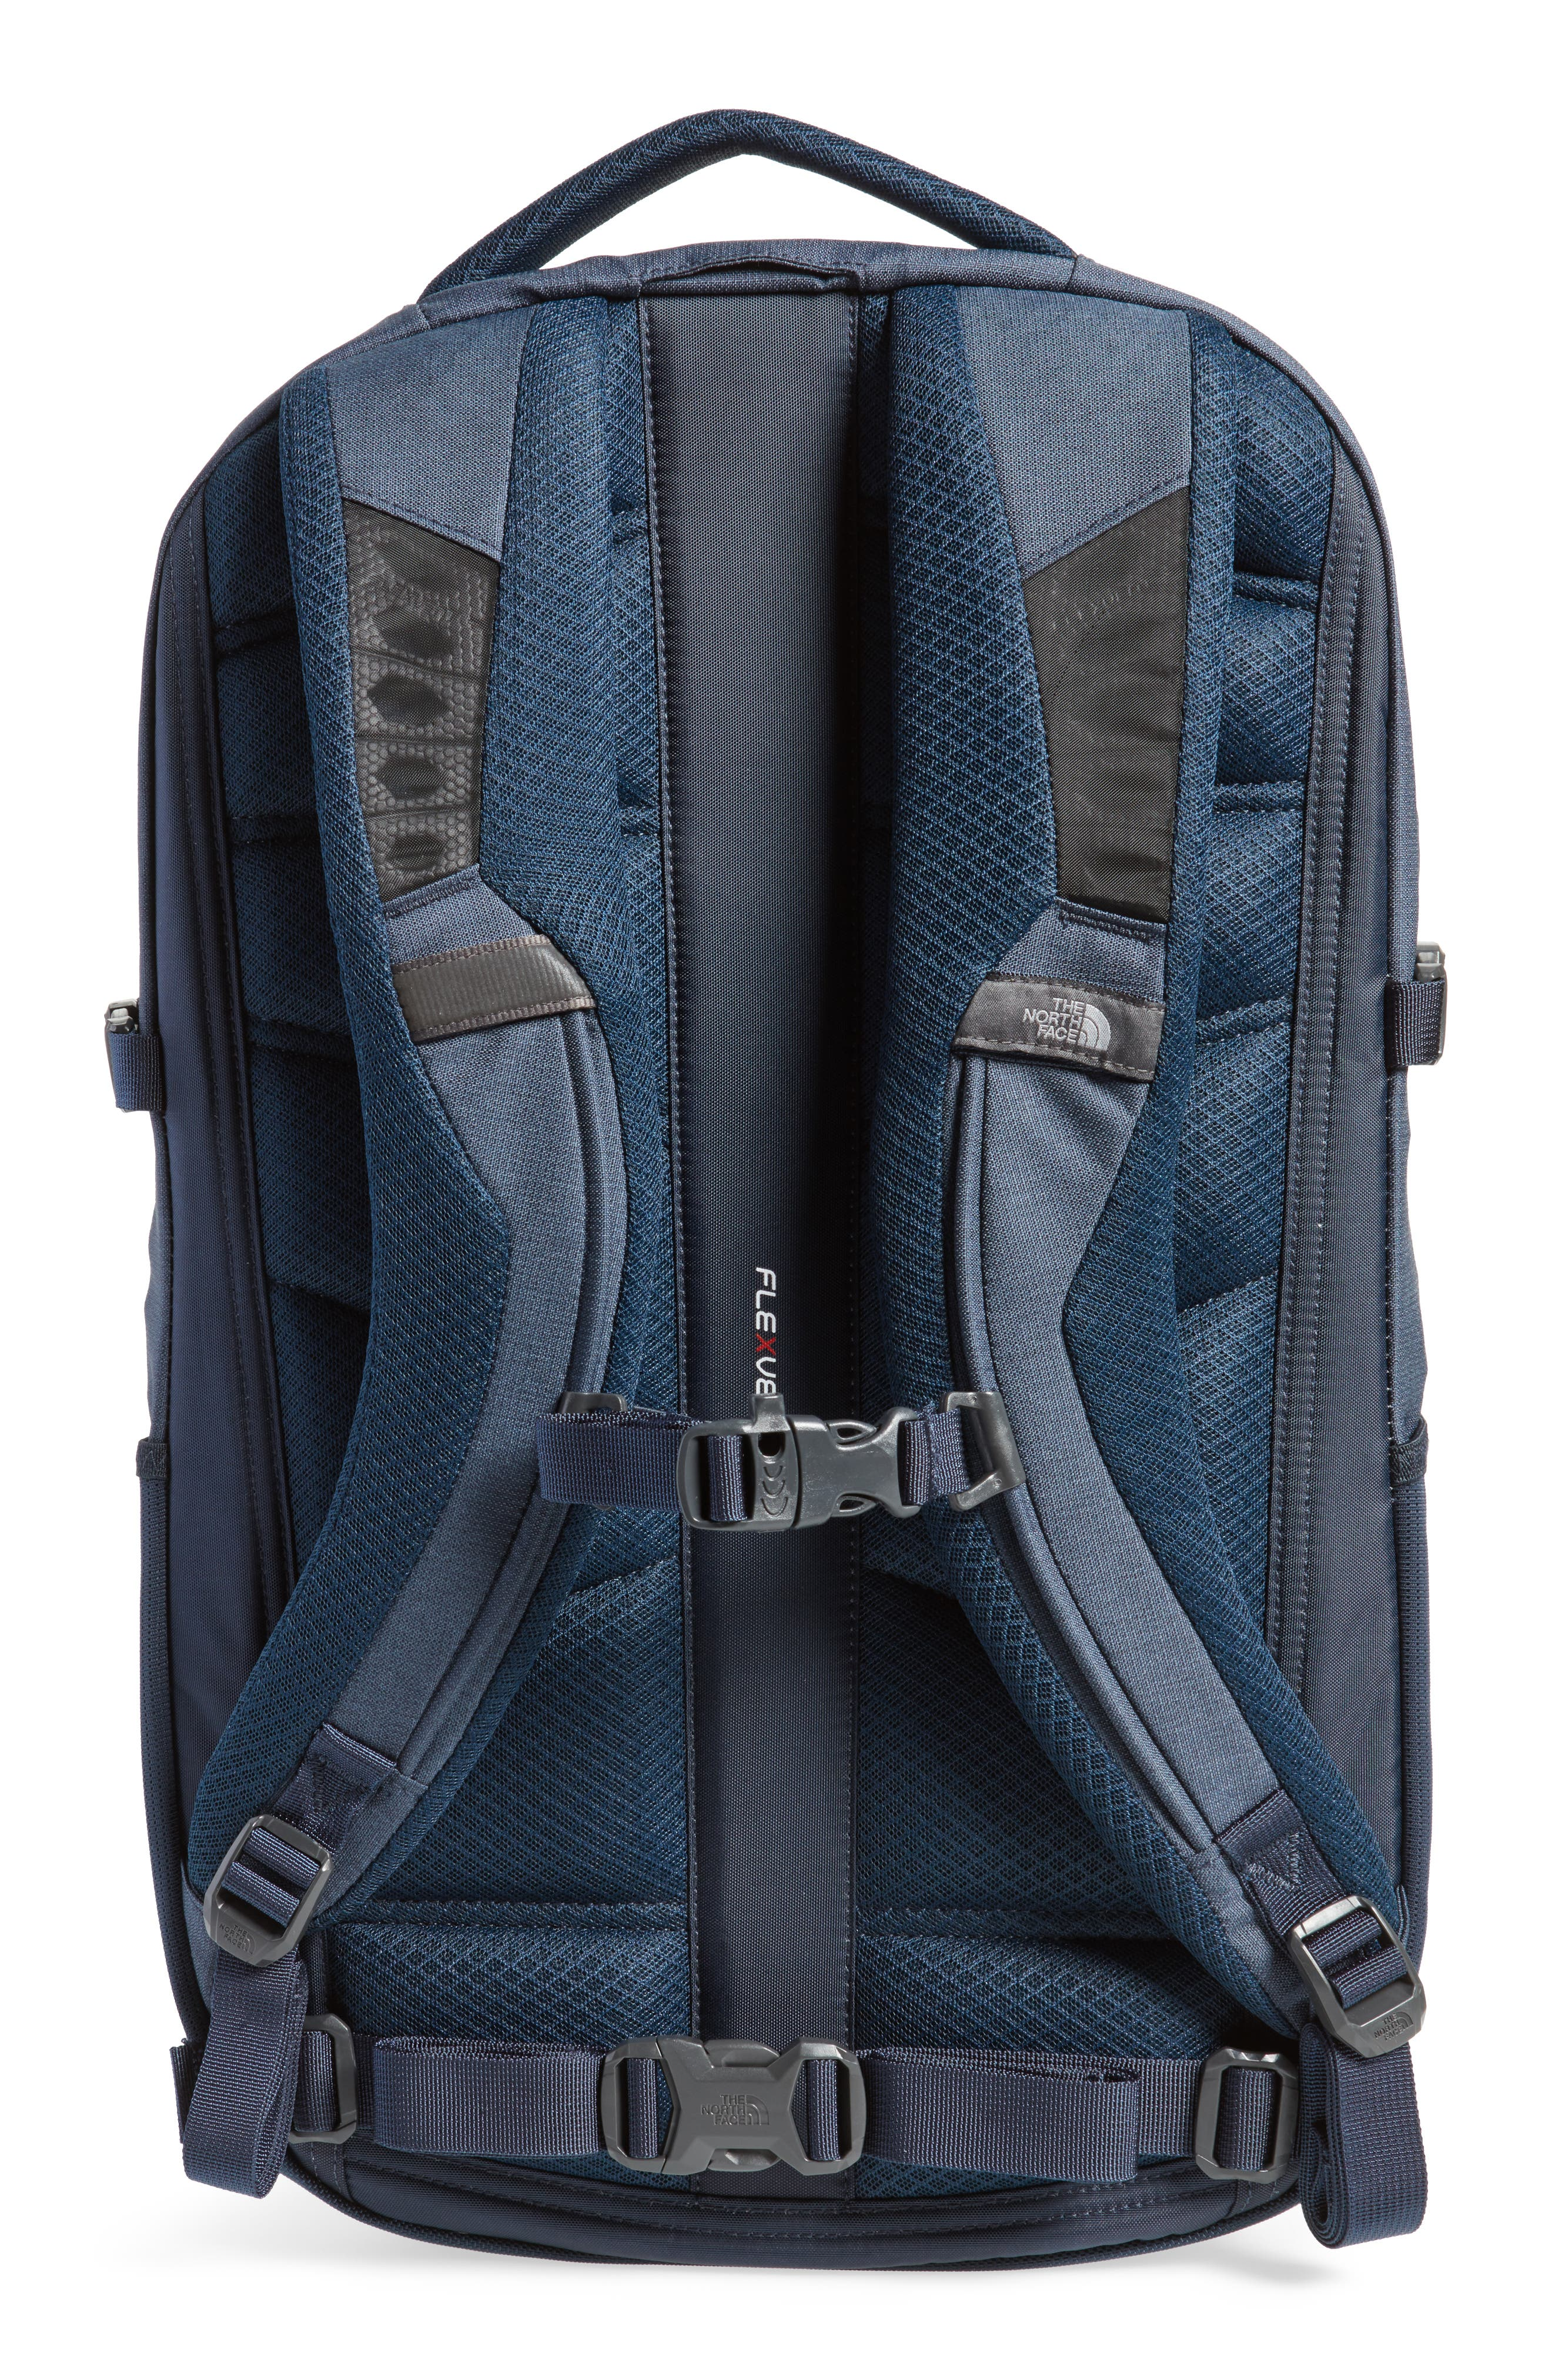 Iron Peak Backpack,                             Alternate thumbnail 11, color,